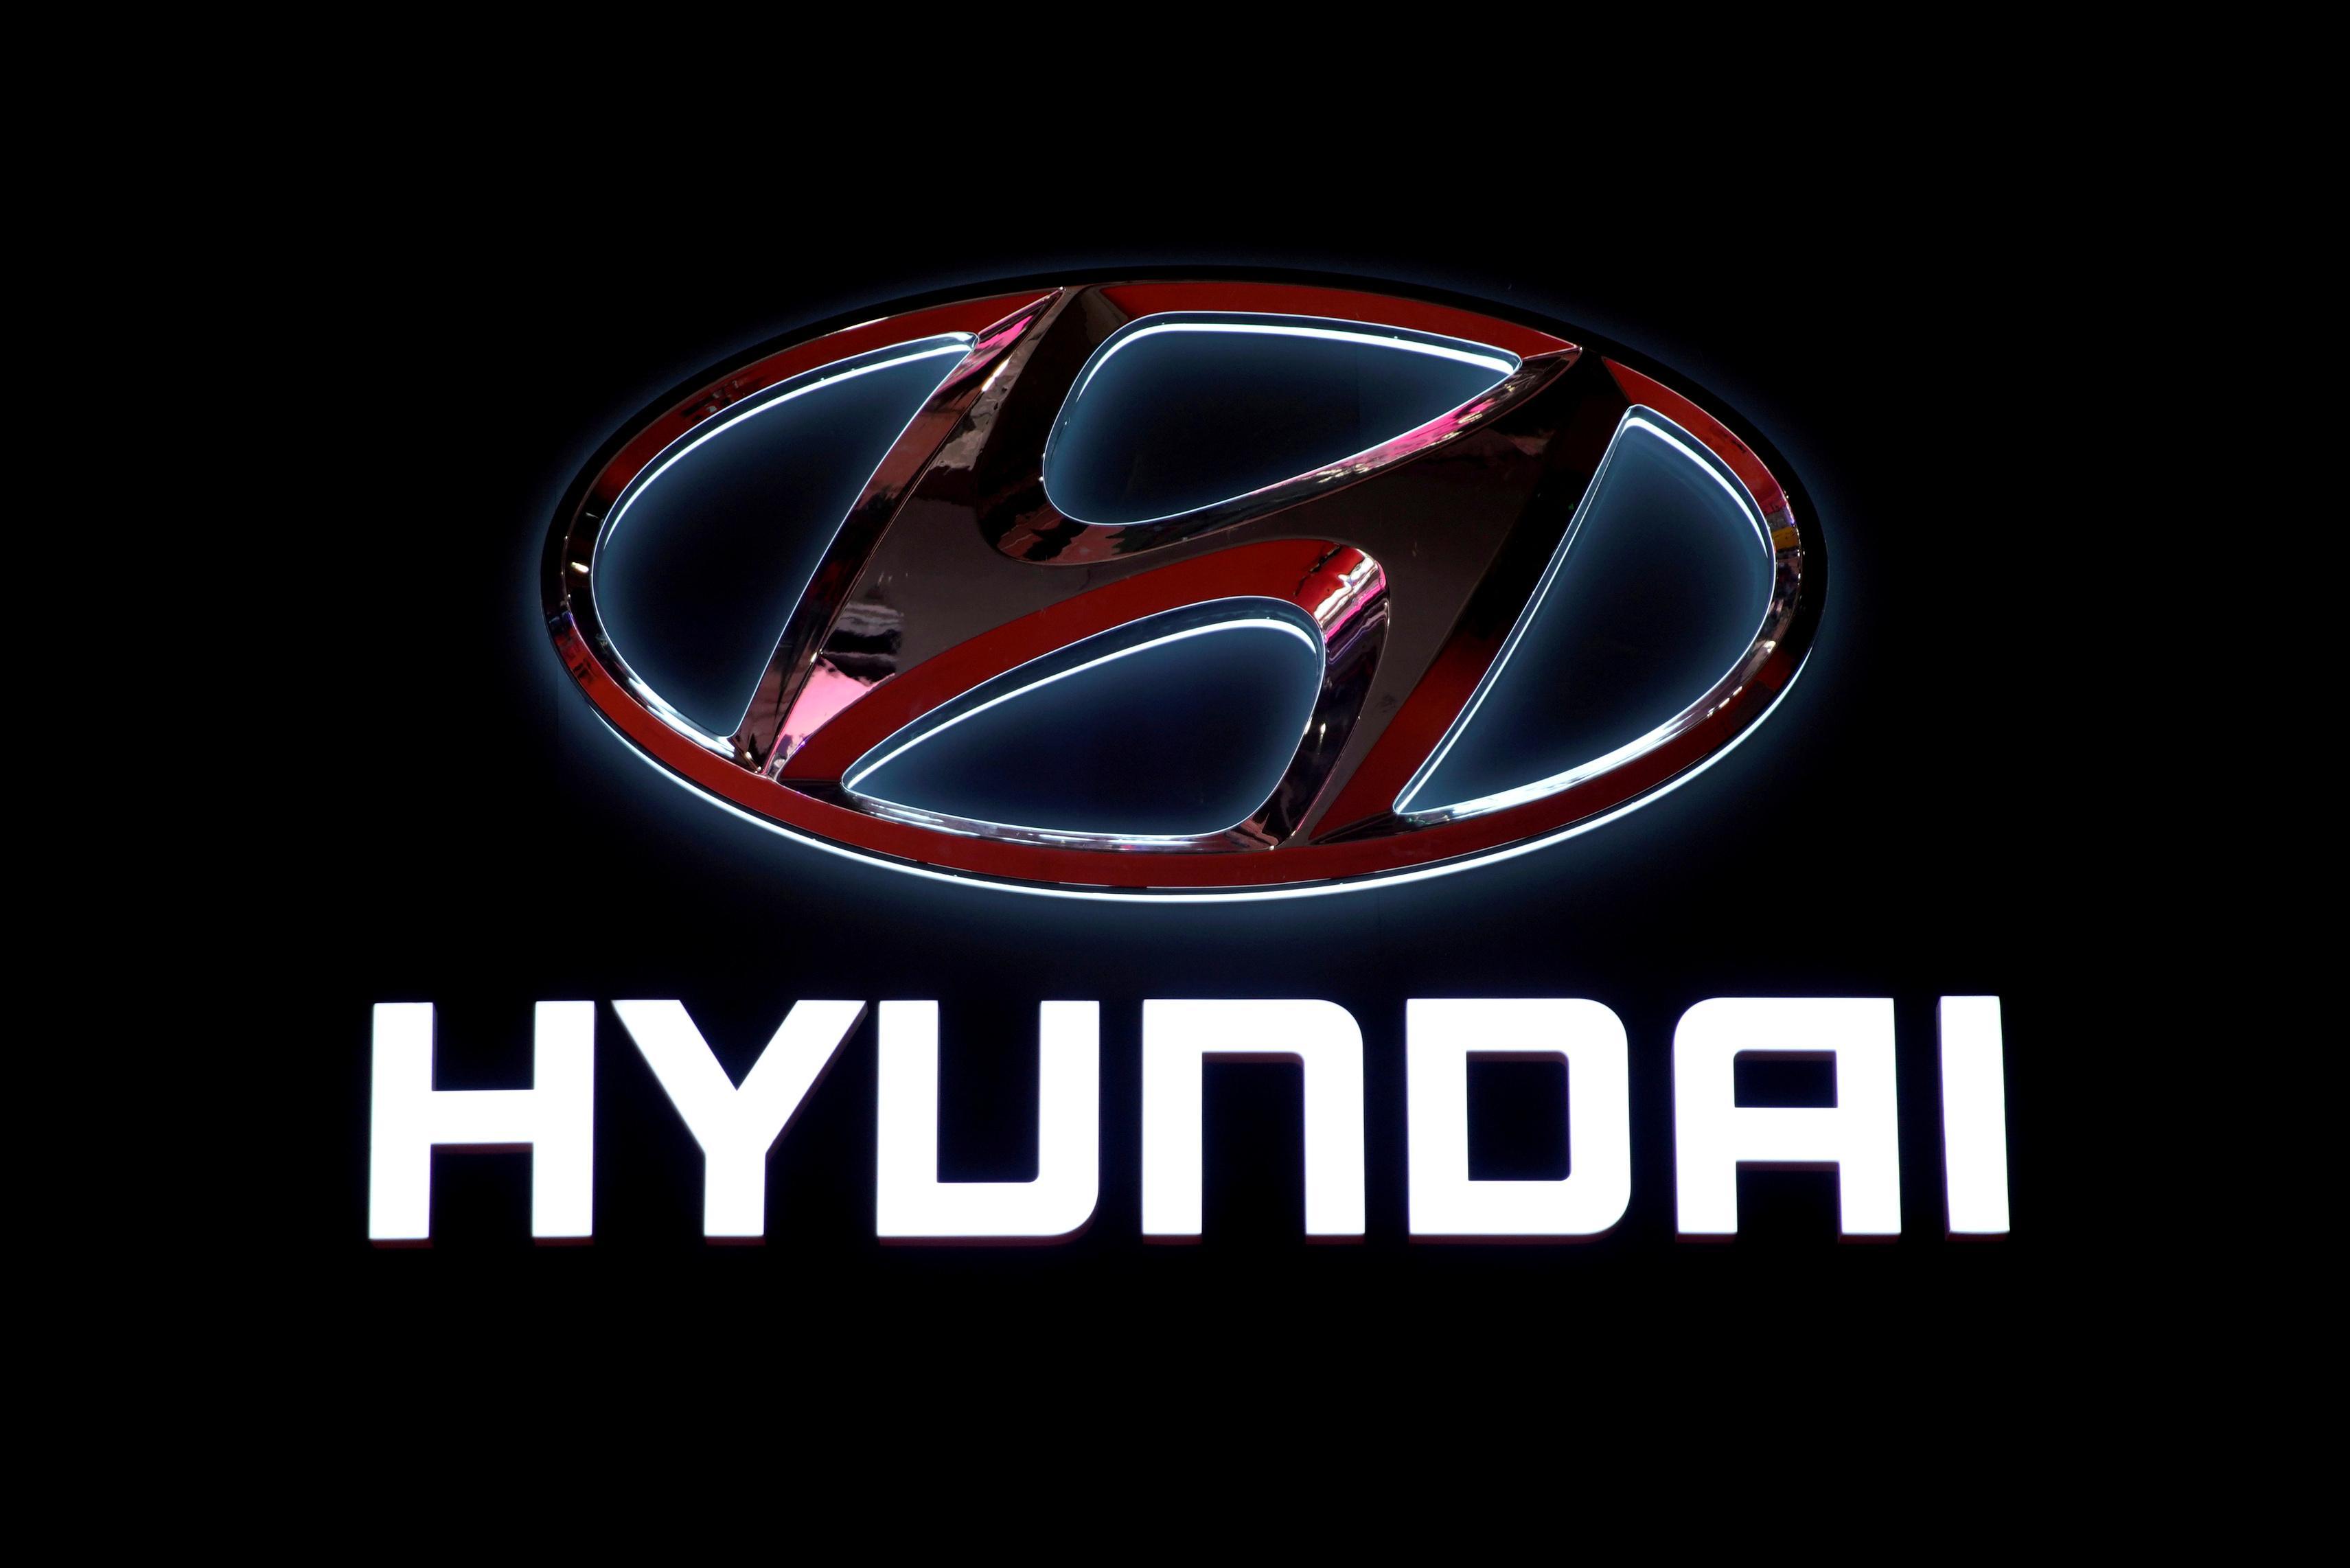 Hyundai, Kia earmark $760 million to settle U.S. lawsuits over...